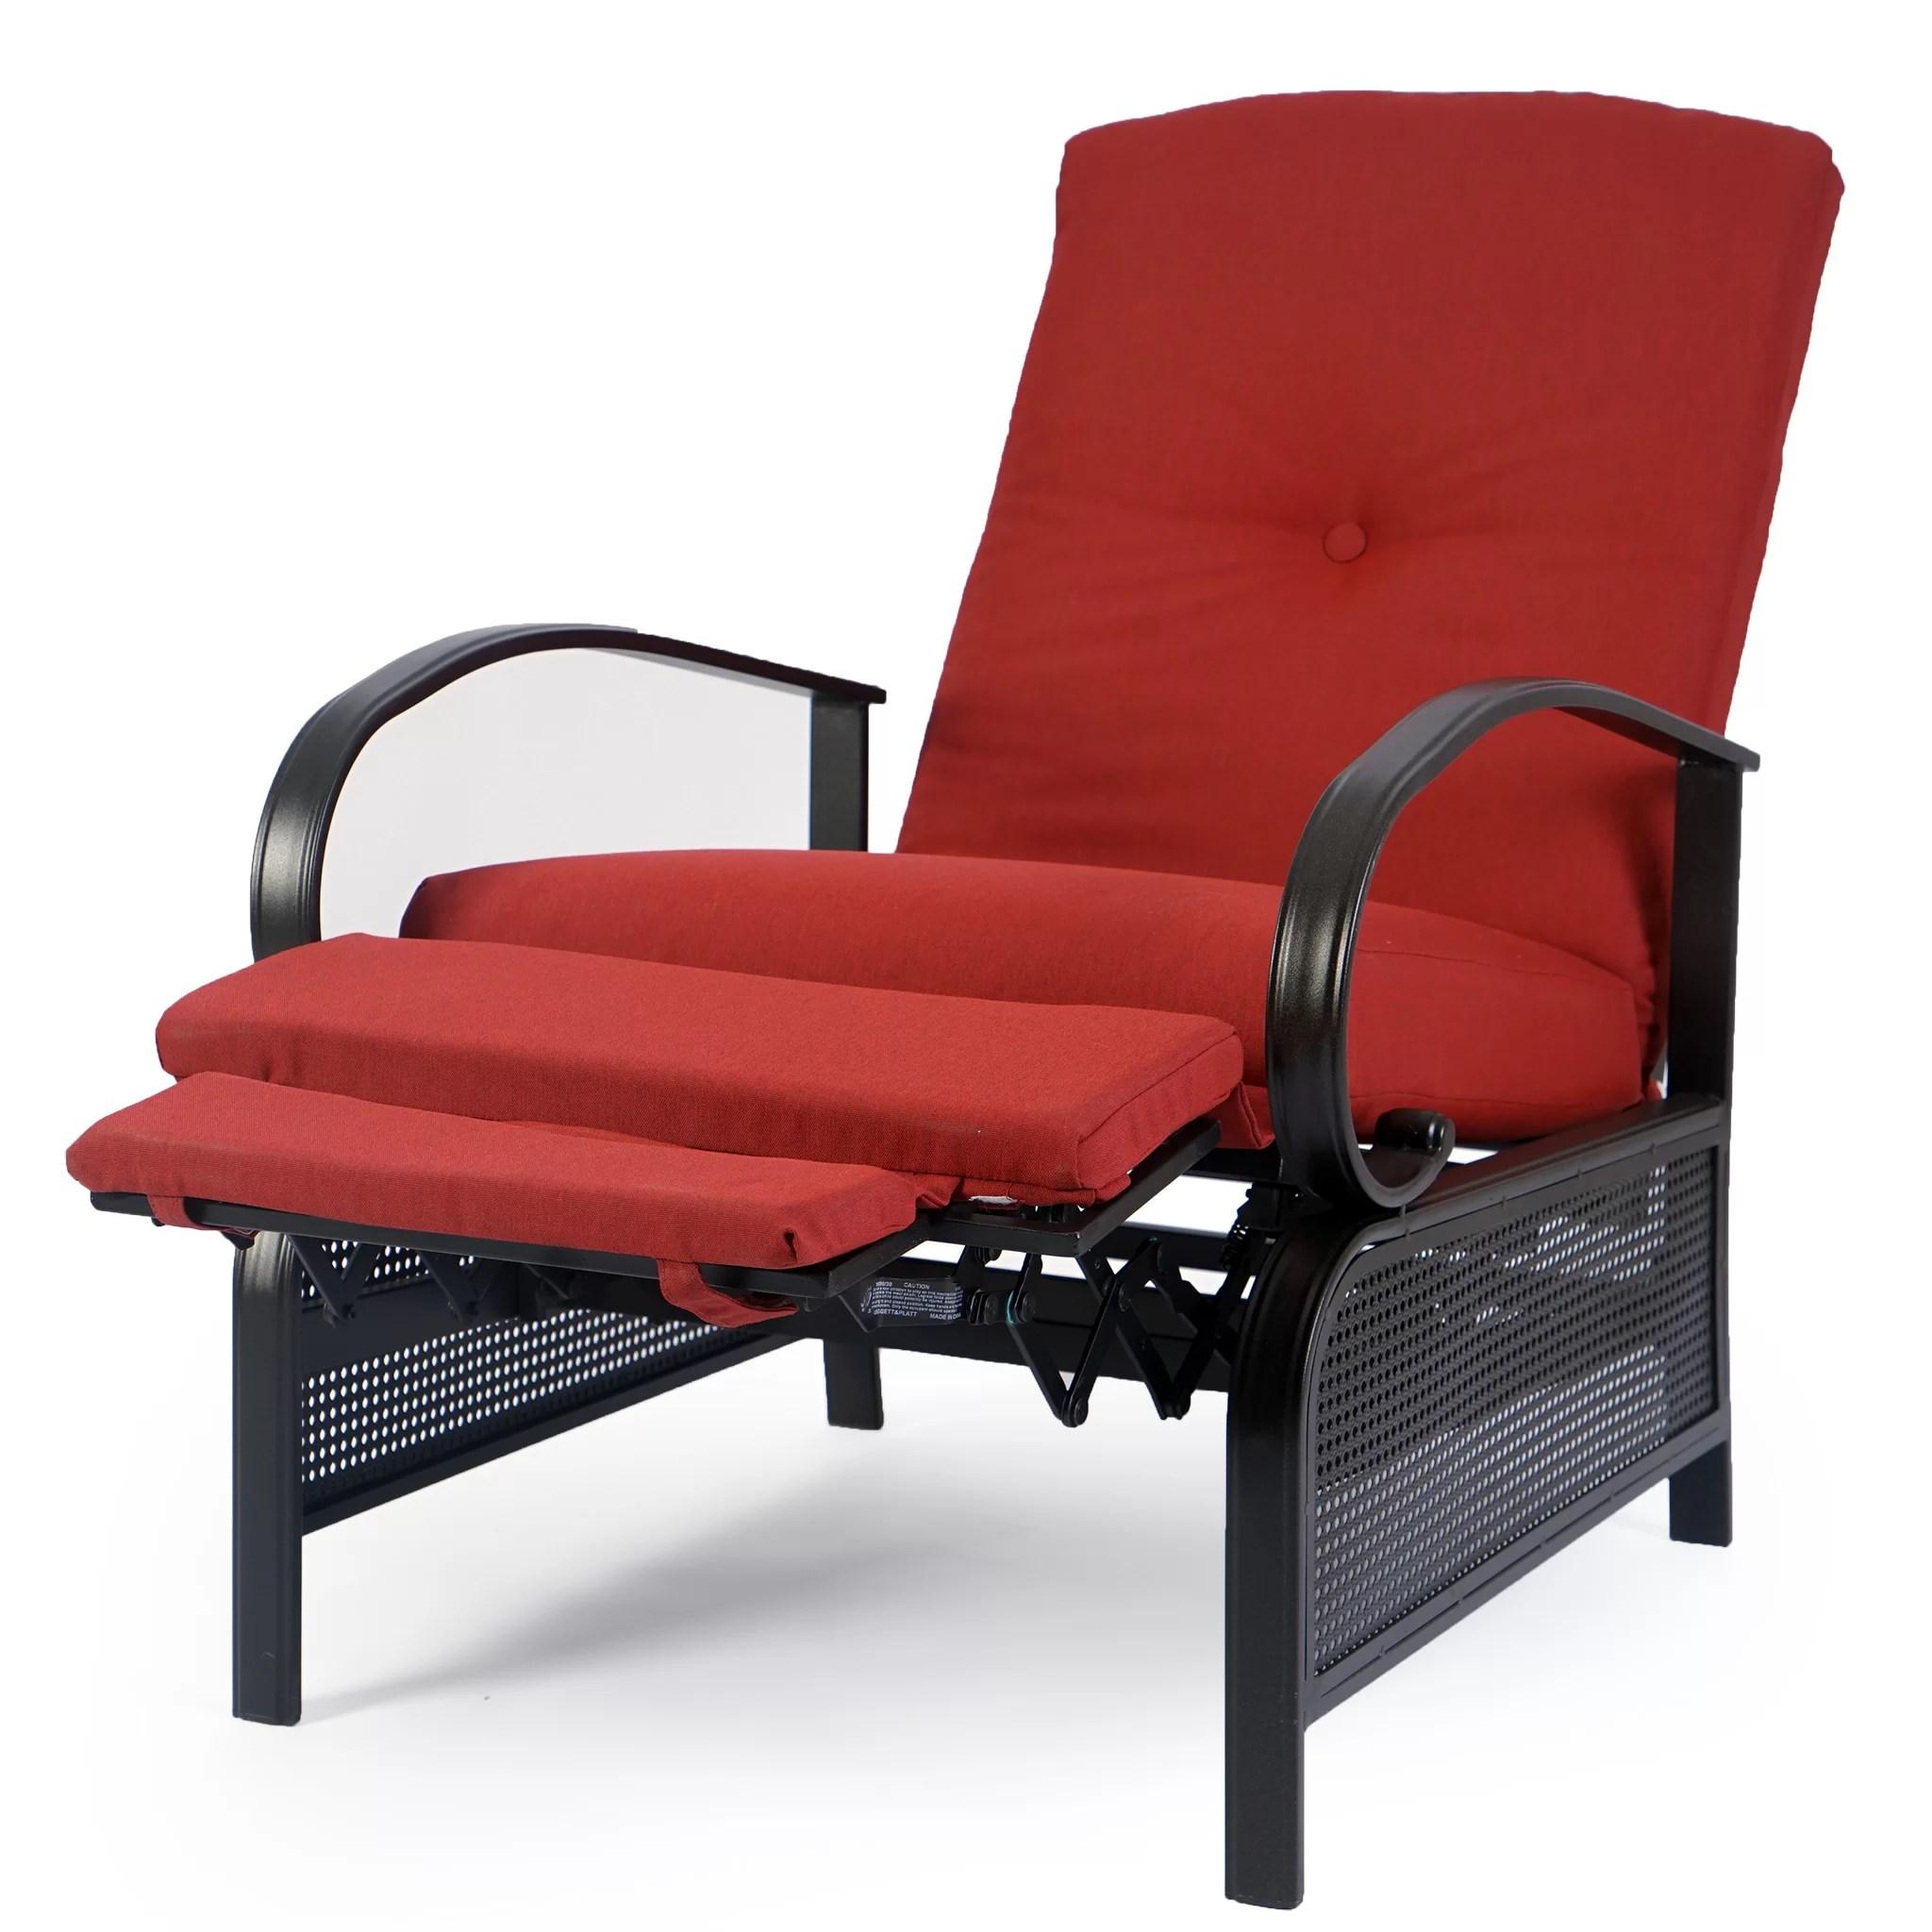 aadhira recliner patio chair with cushions